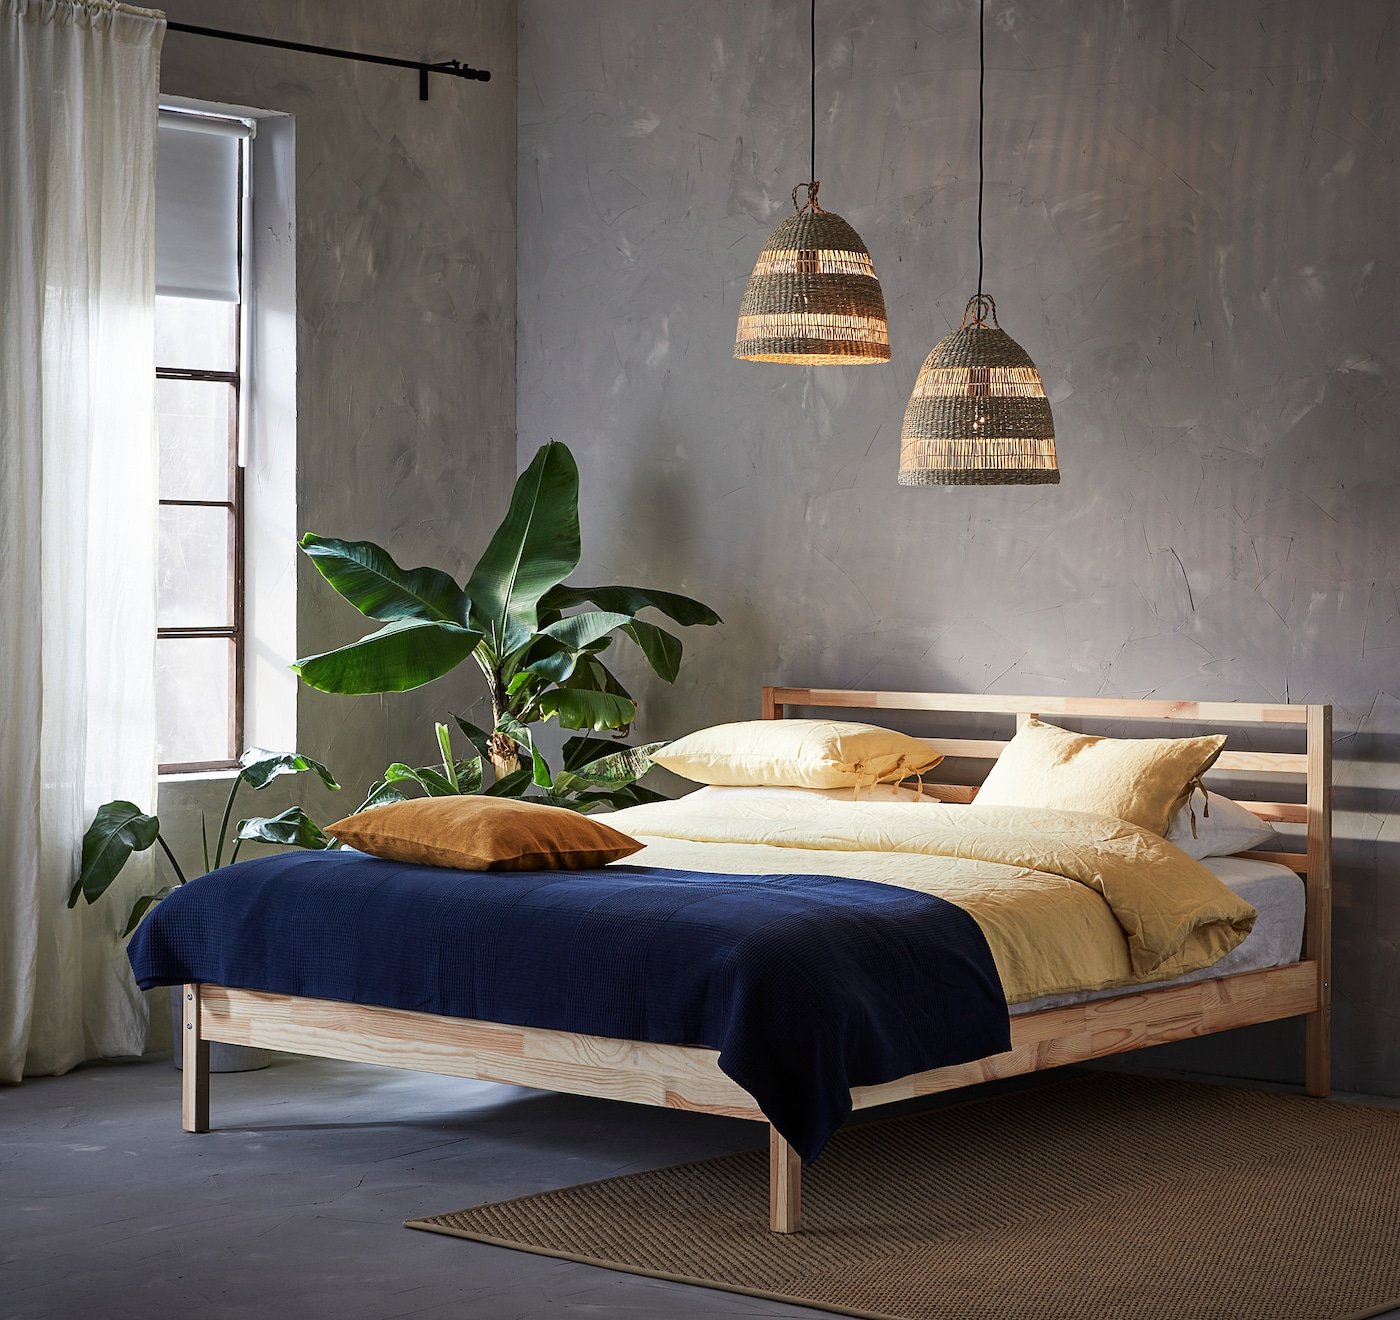 Torared Pendant Lamp Shade Seagrass Height 13 Diameter 14 Ikea